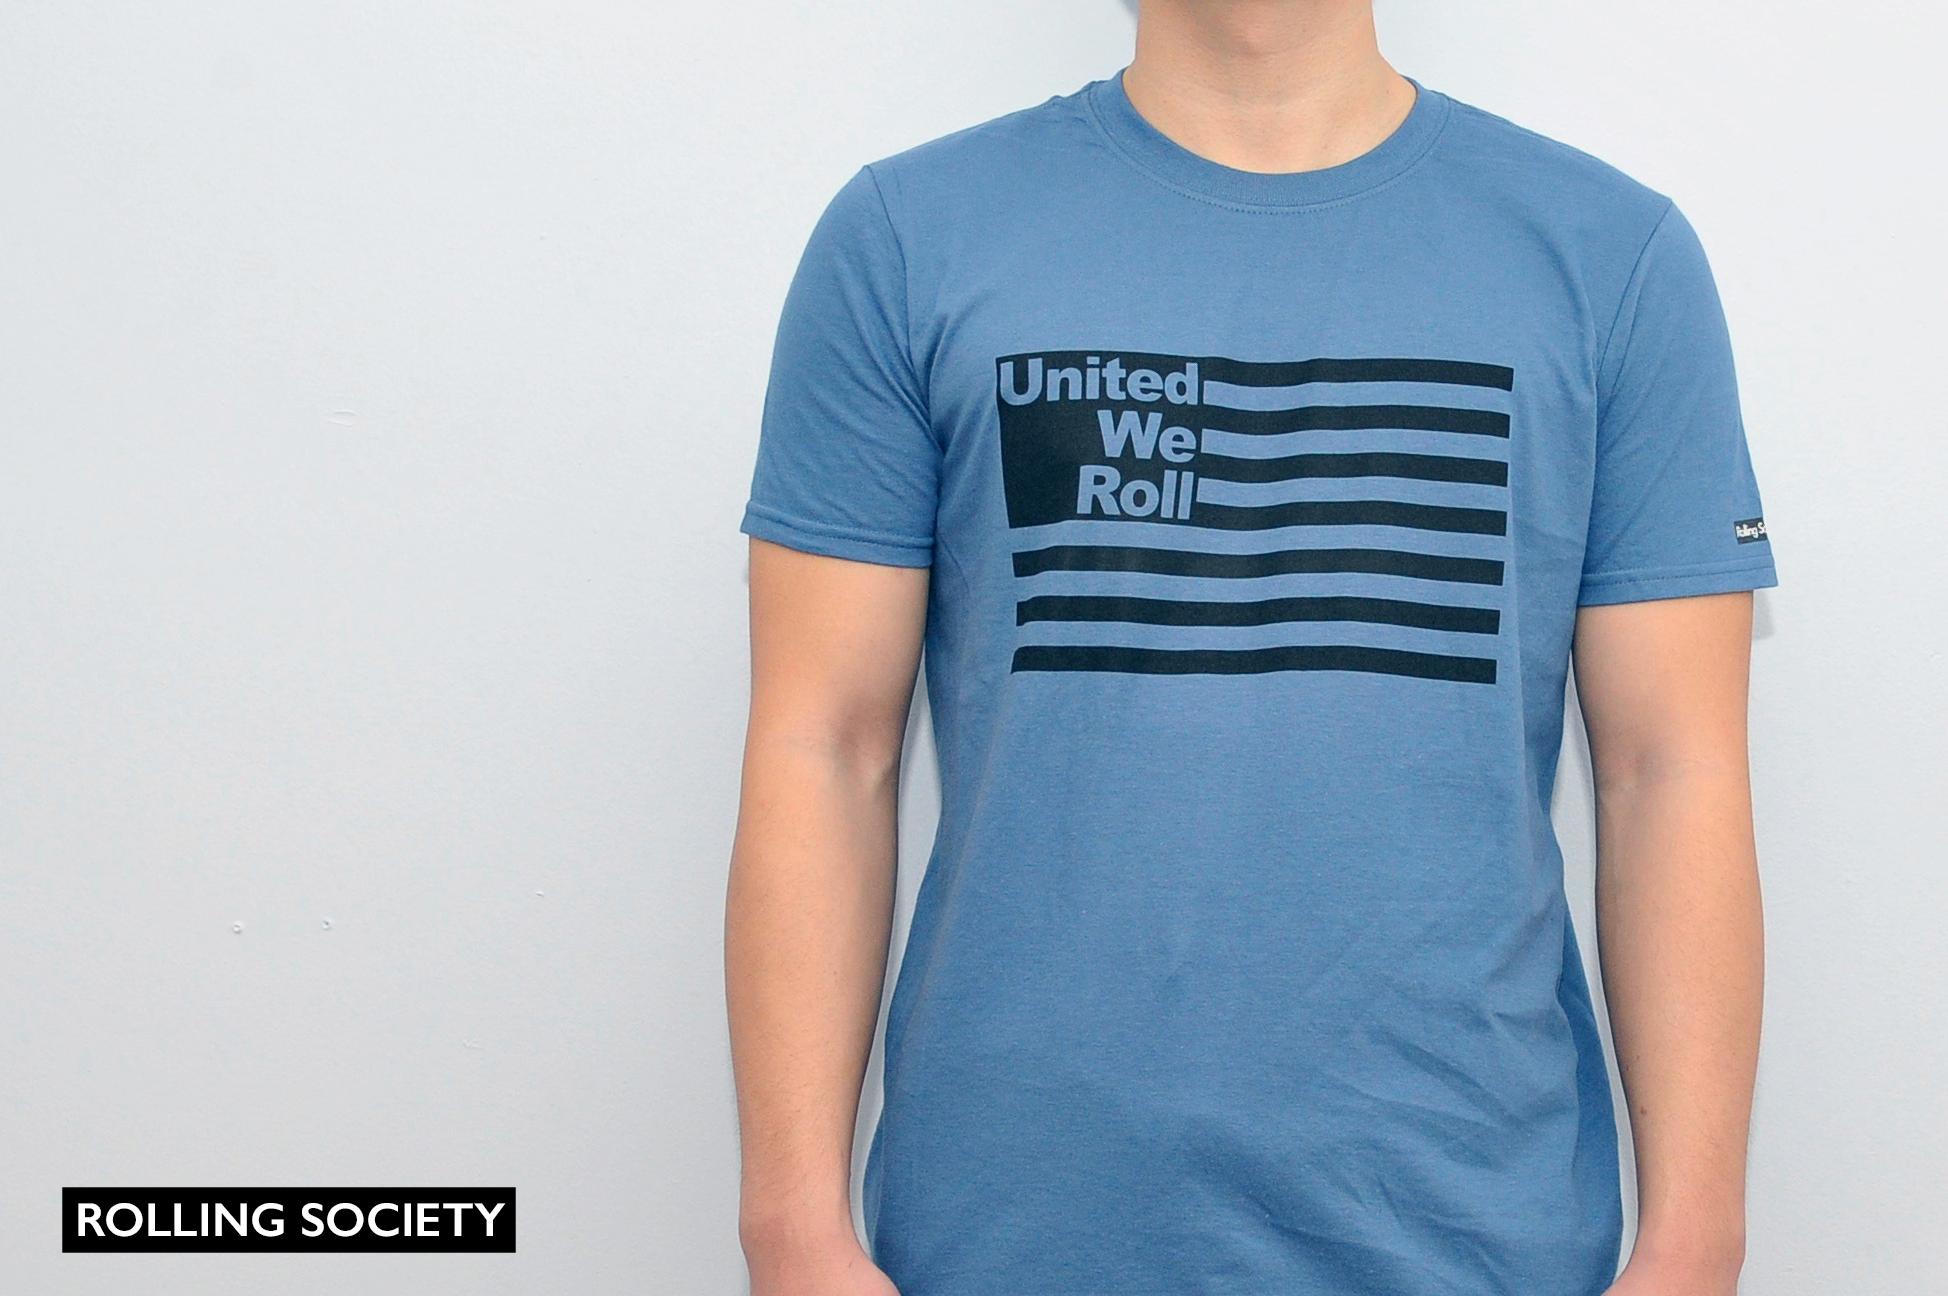 shirt_reference_United2.jpg